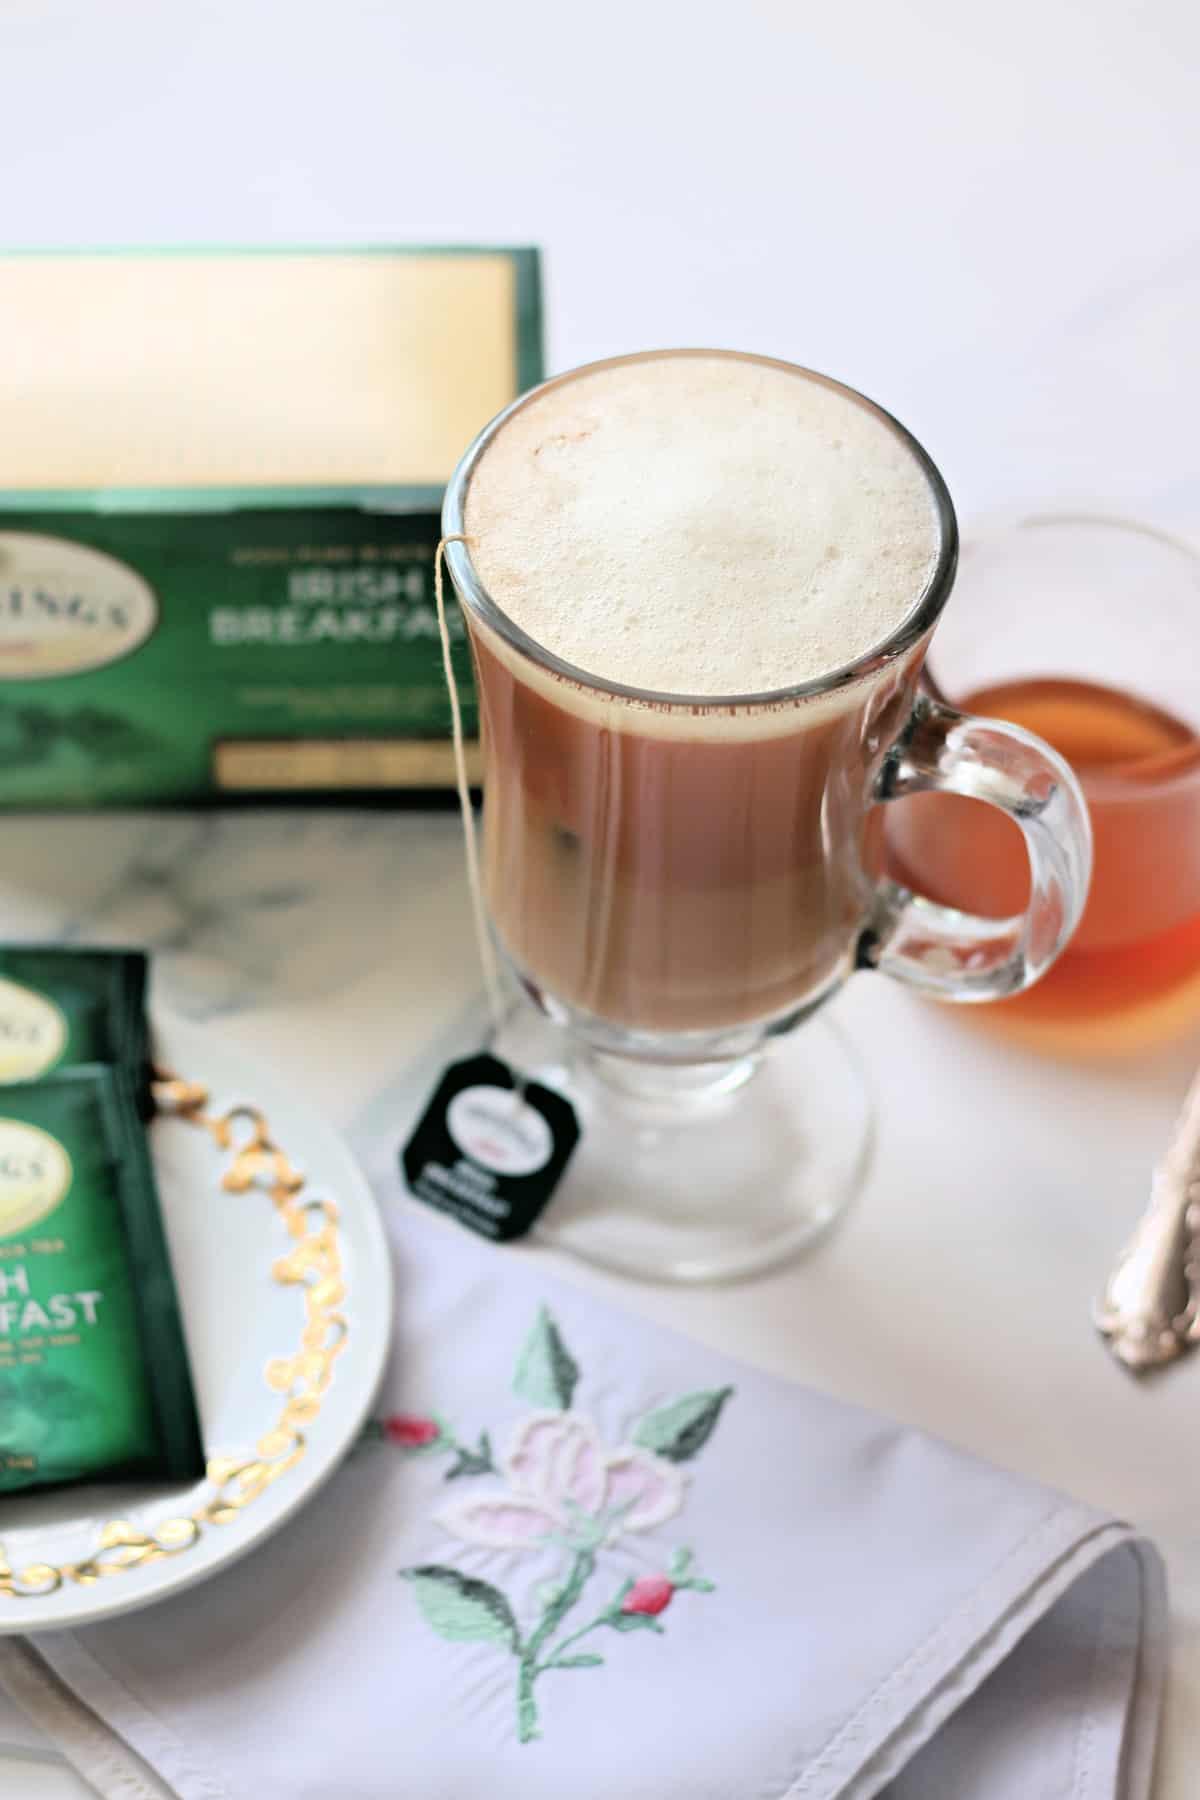 Dublin Fog tea latte in a glass mug.